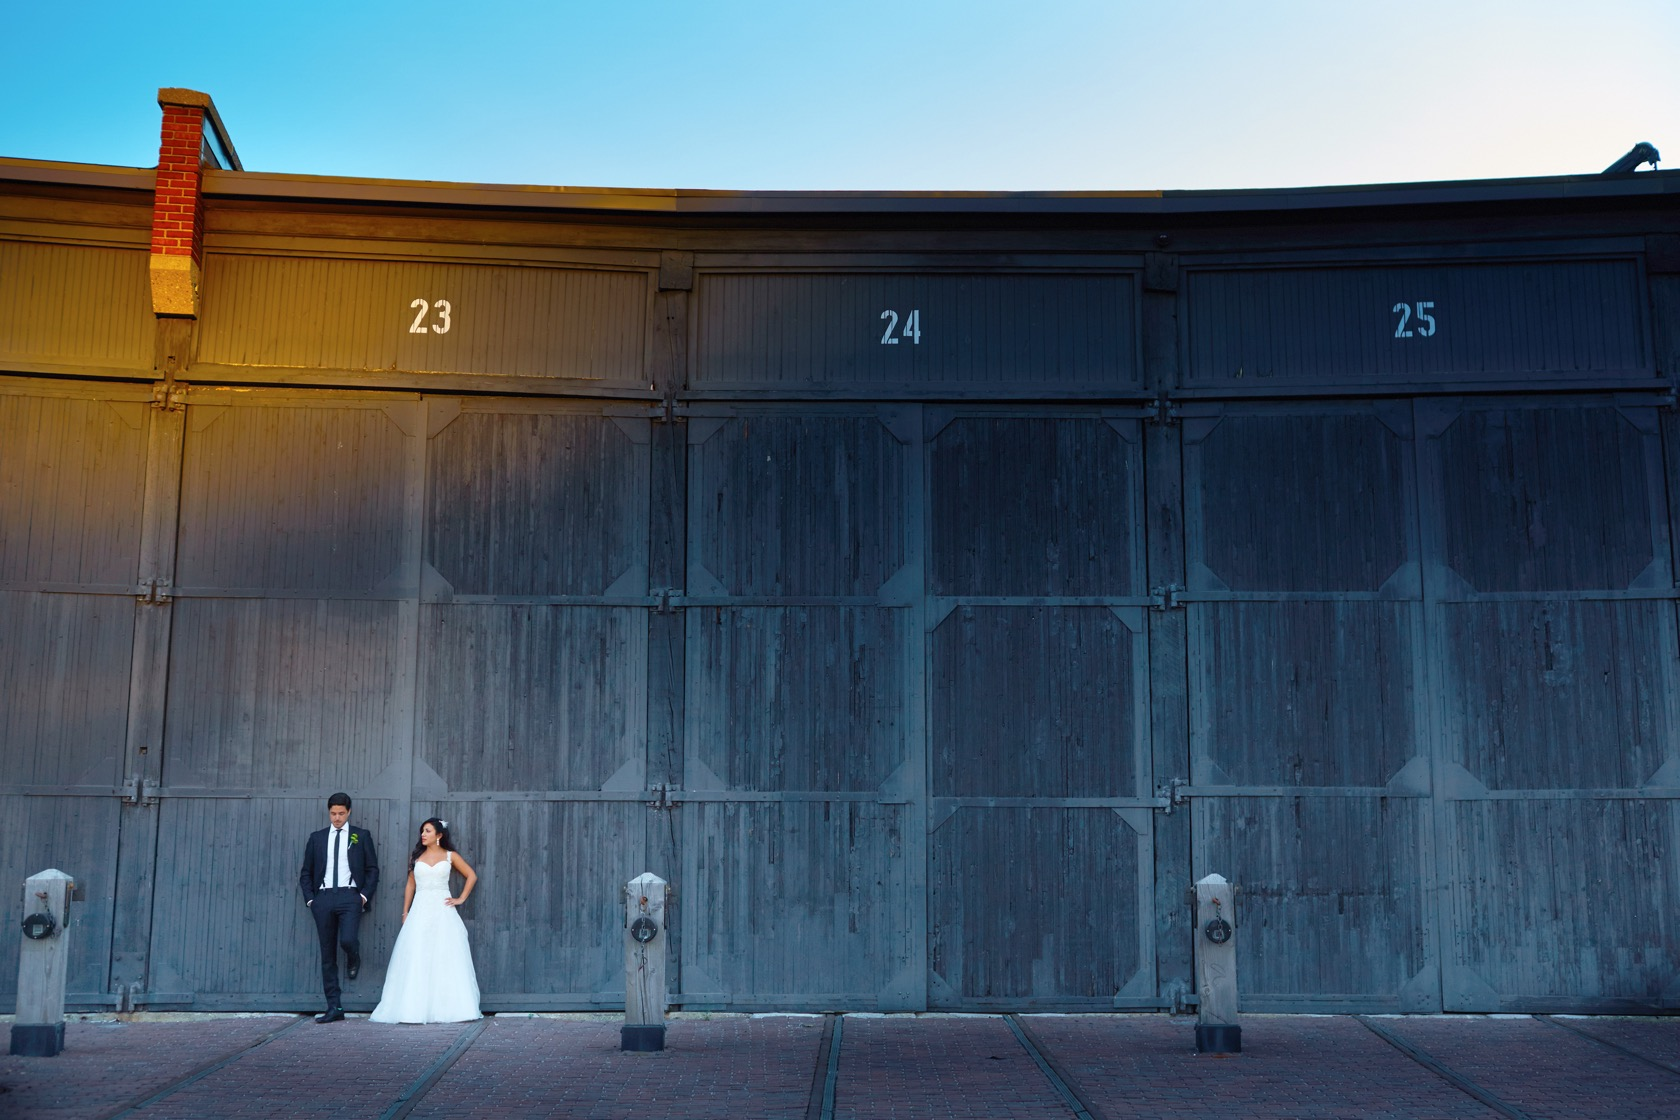 stephen sager photography 2241 toronto wedding photography